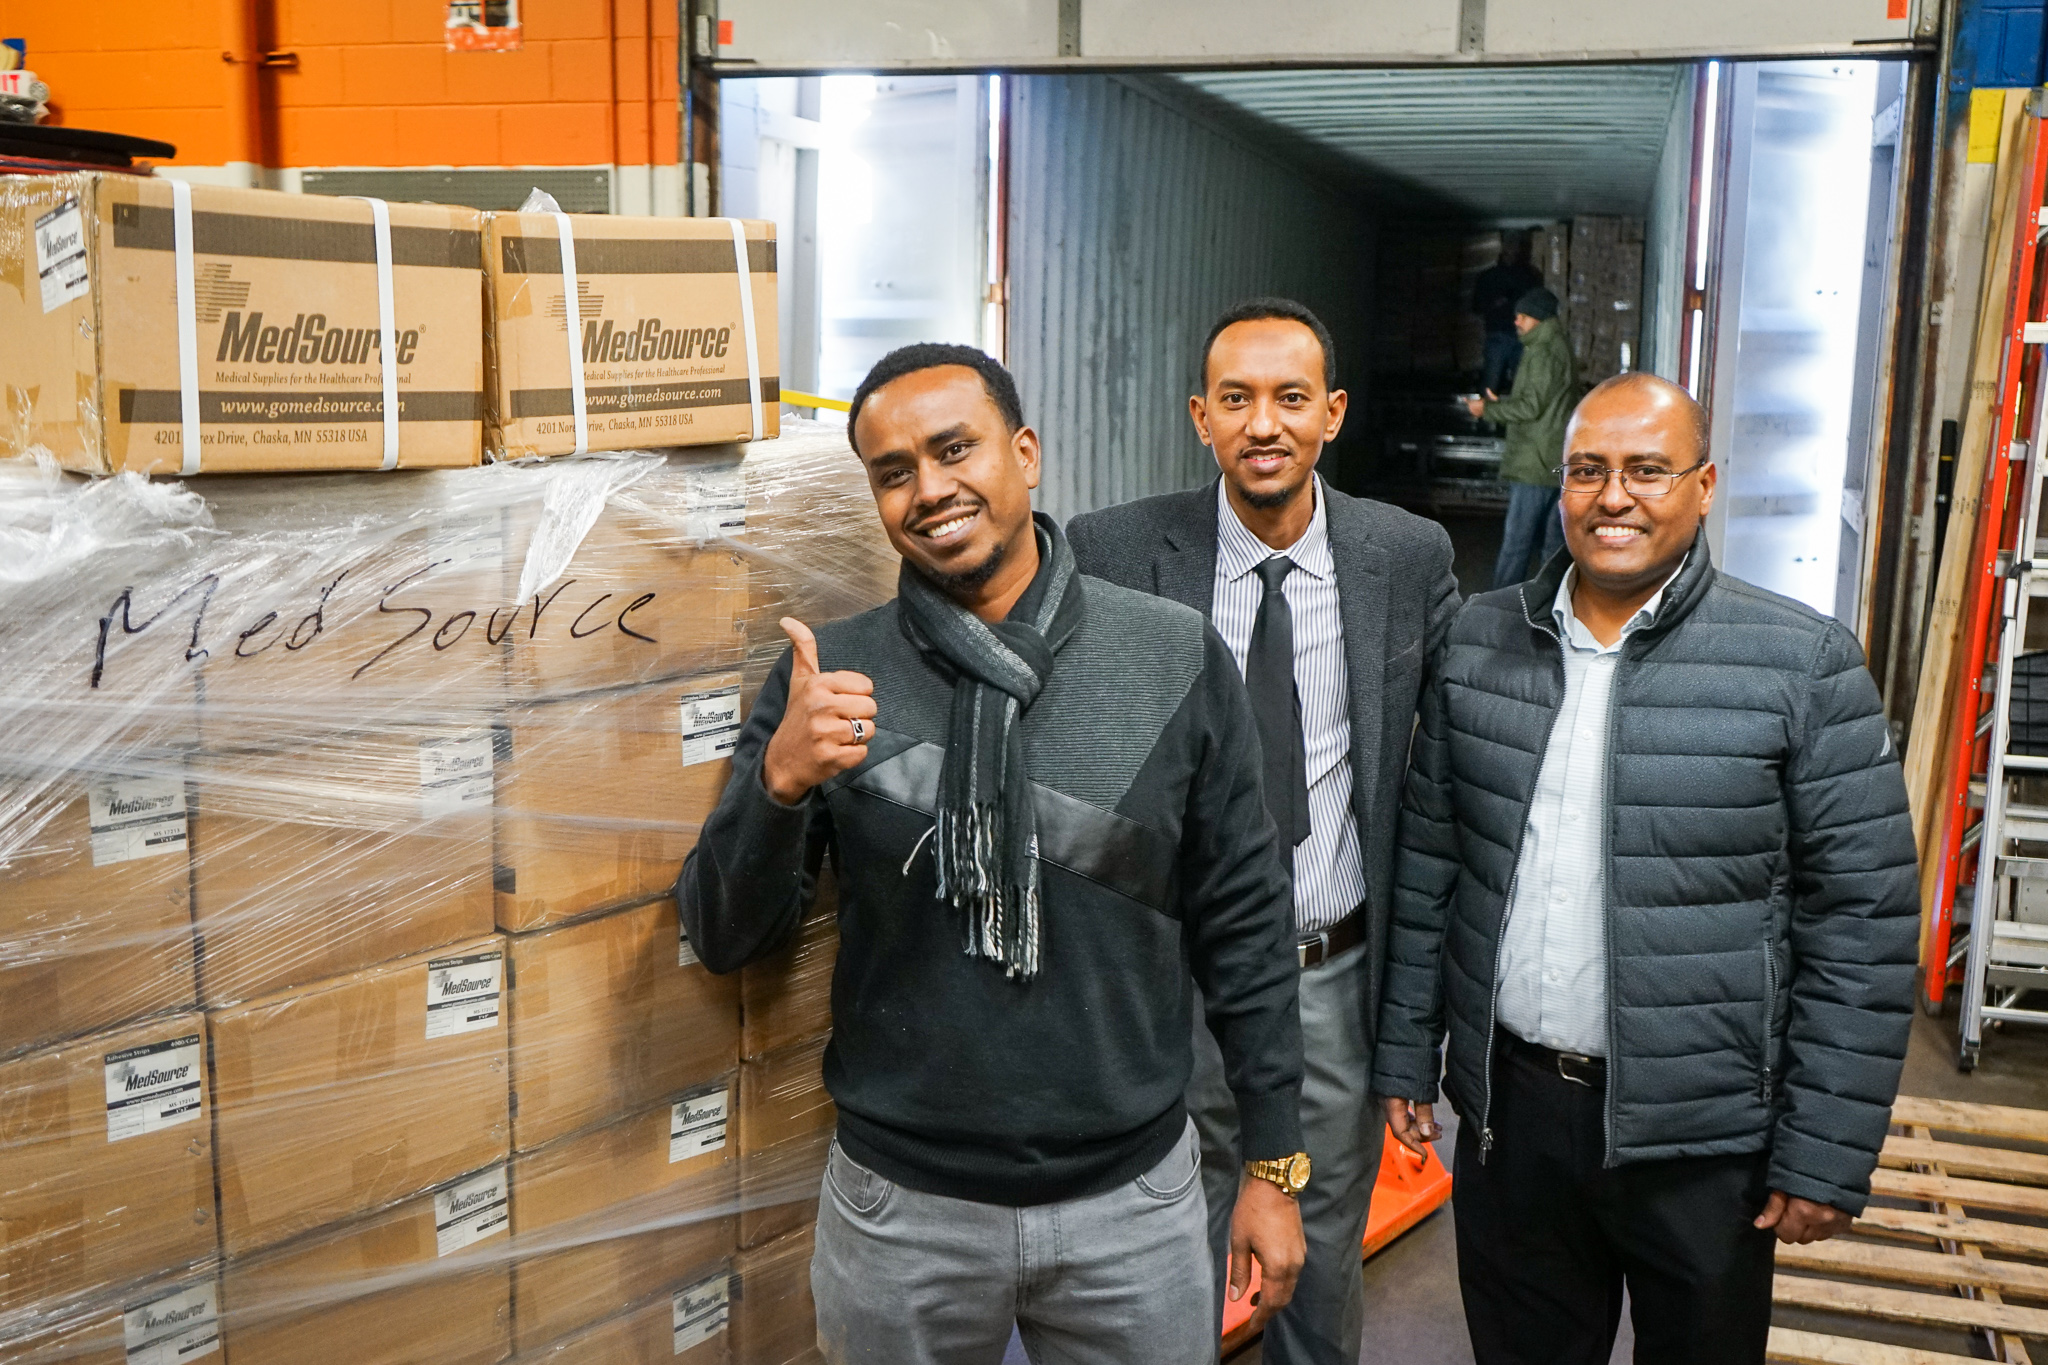 Fulfilling Dreams to Improve Healthcare in Ethiopia